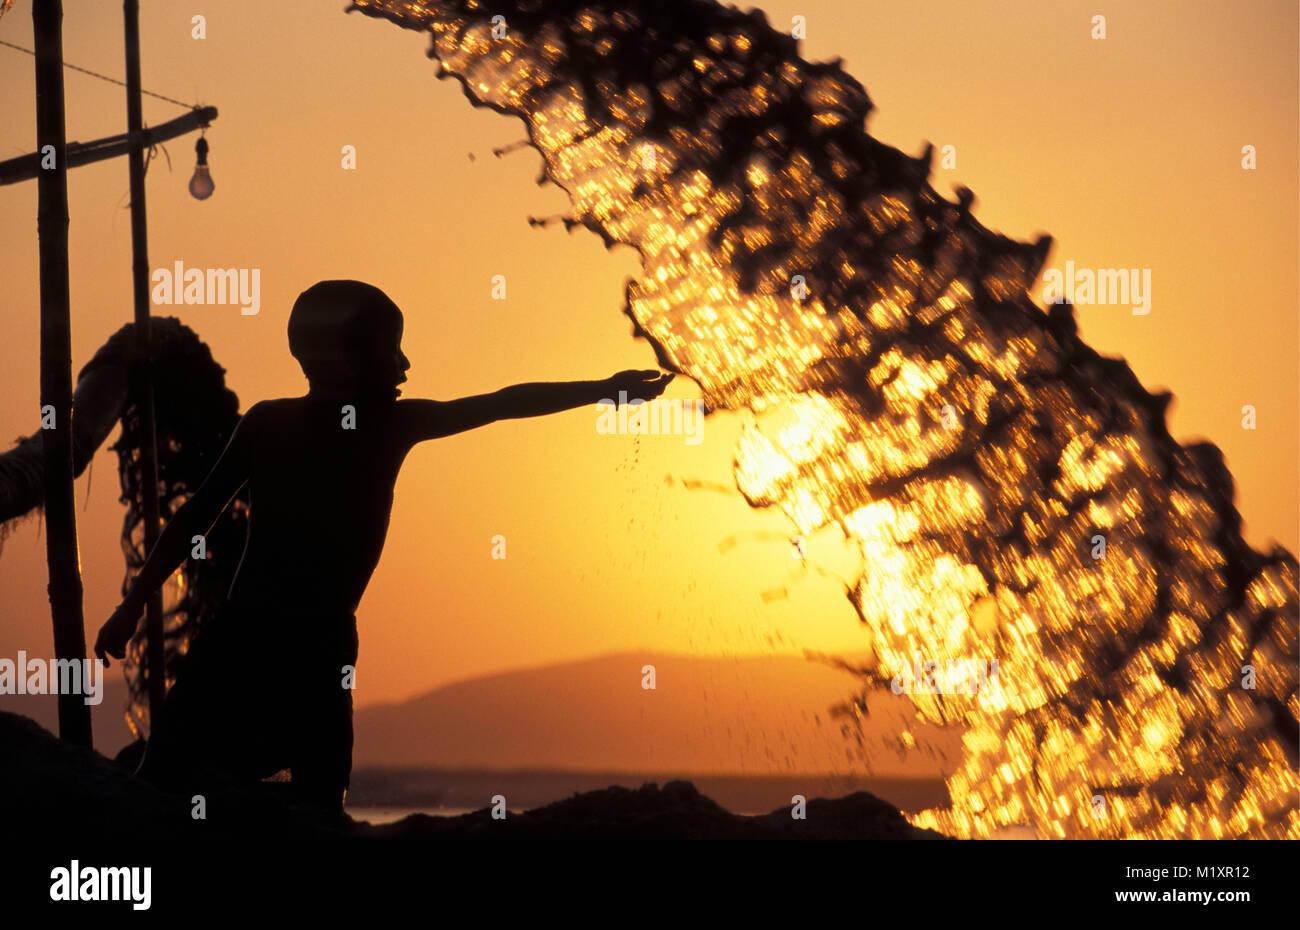 Myanmar (Birmania). Mandalay. Ayeyarwady Irradwaddy (fiume). Ragazzo giocando con l'acqua. Silhouette. Il tramonto. Immagini Stock